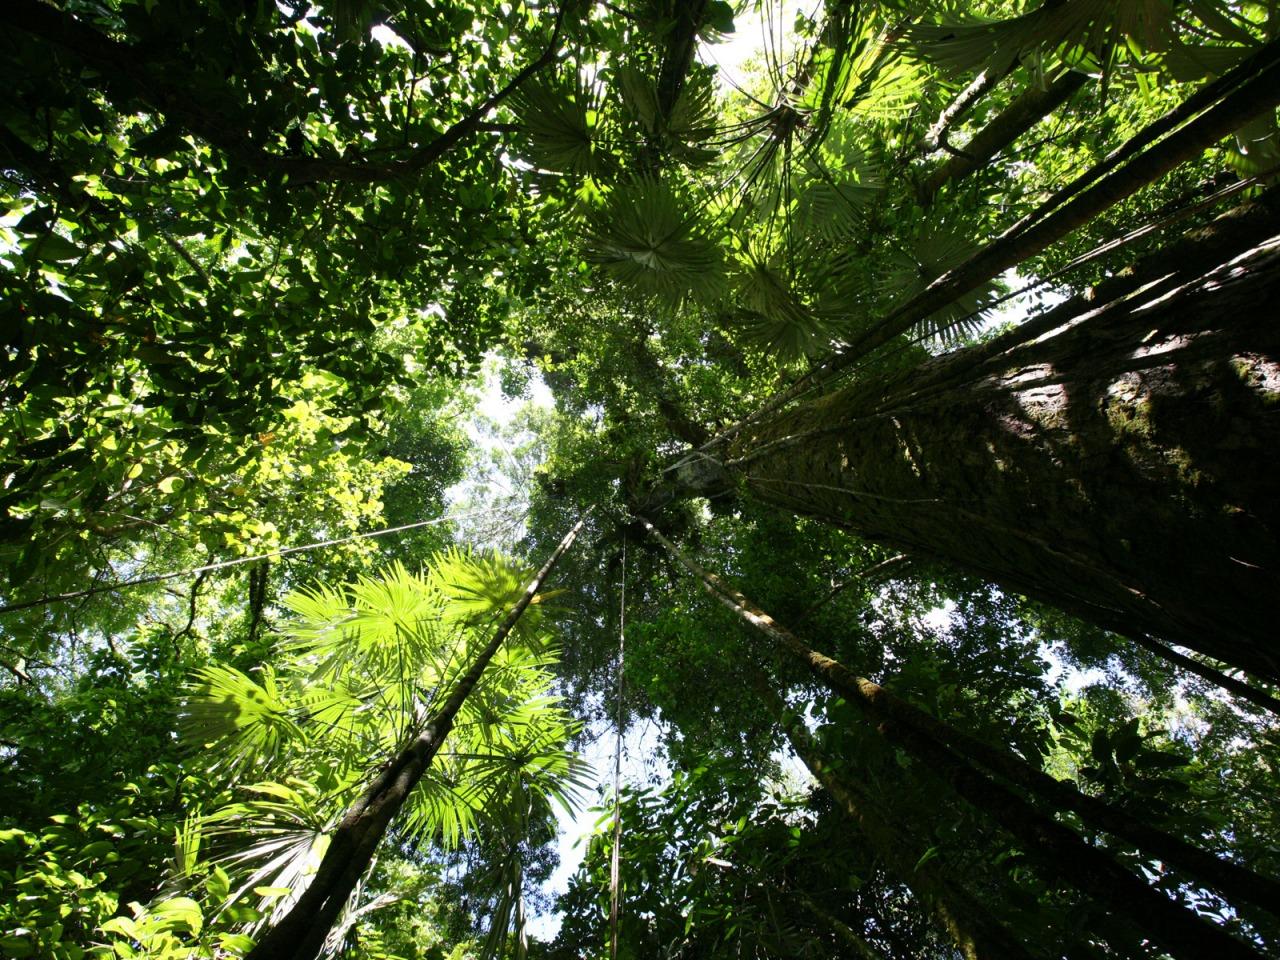 Kelsey Cooley Rainforest Hd